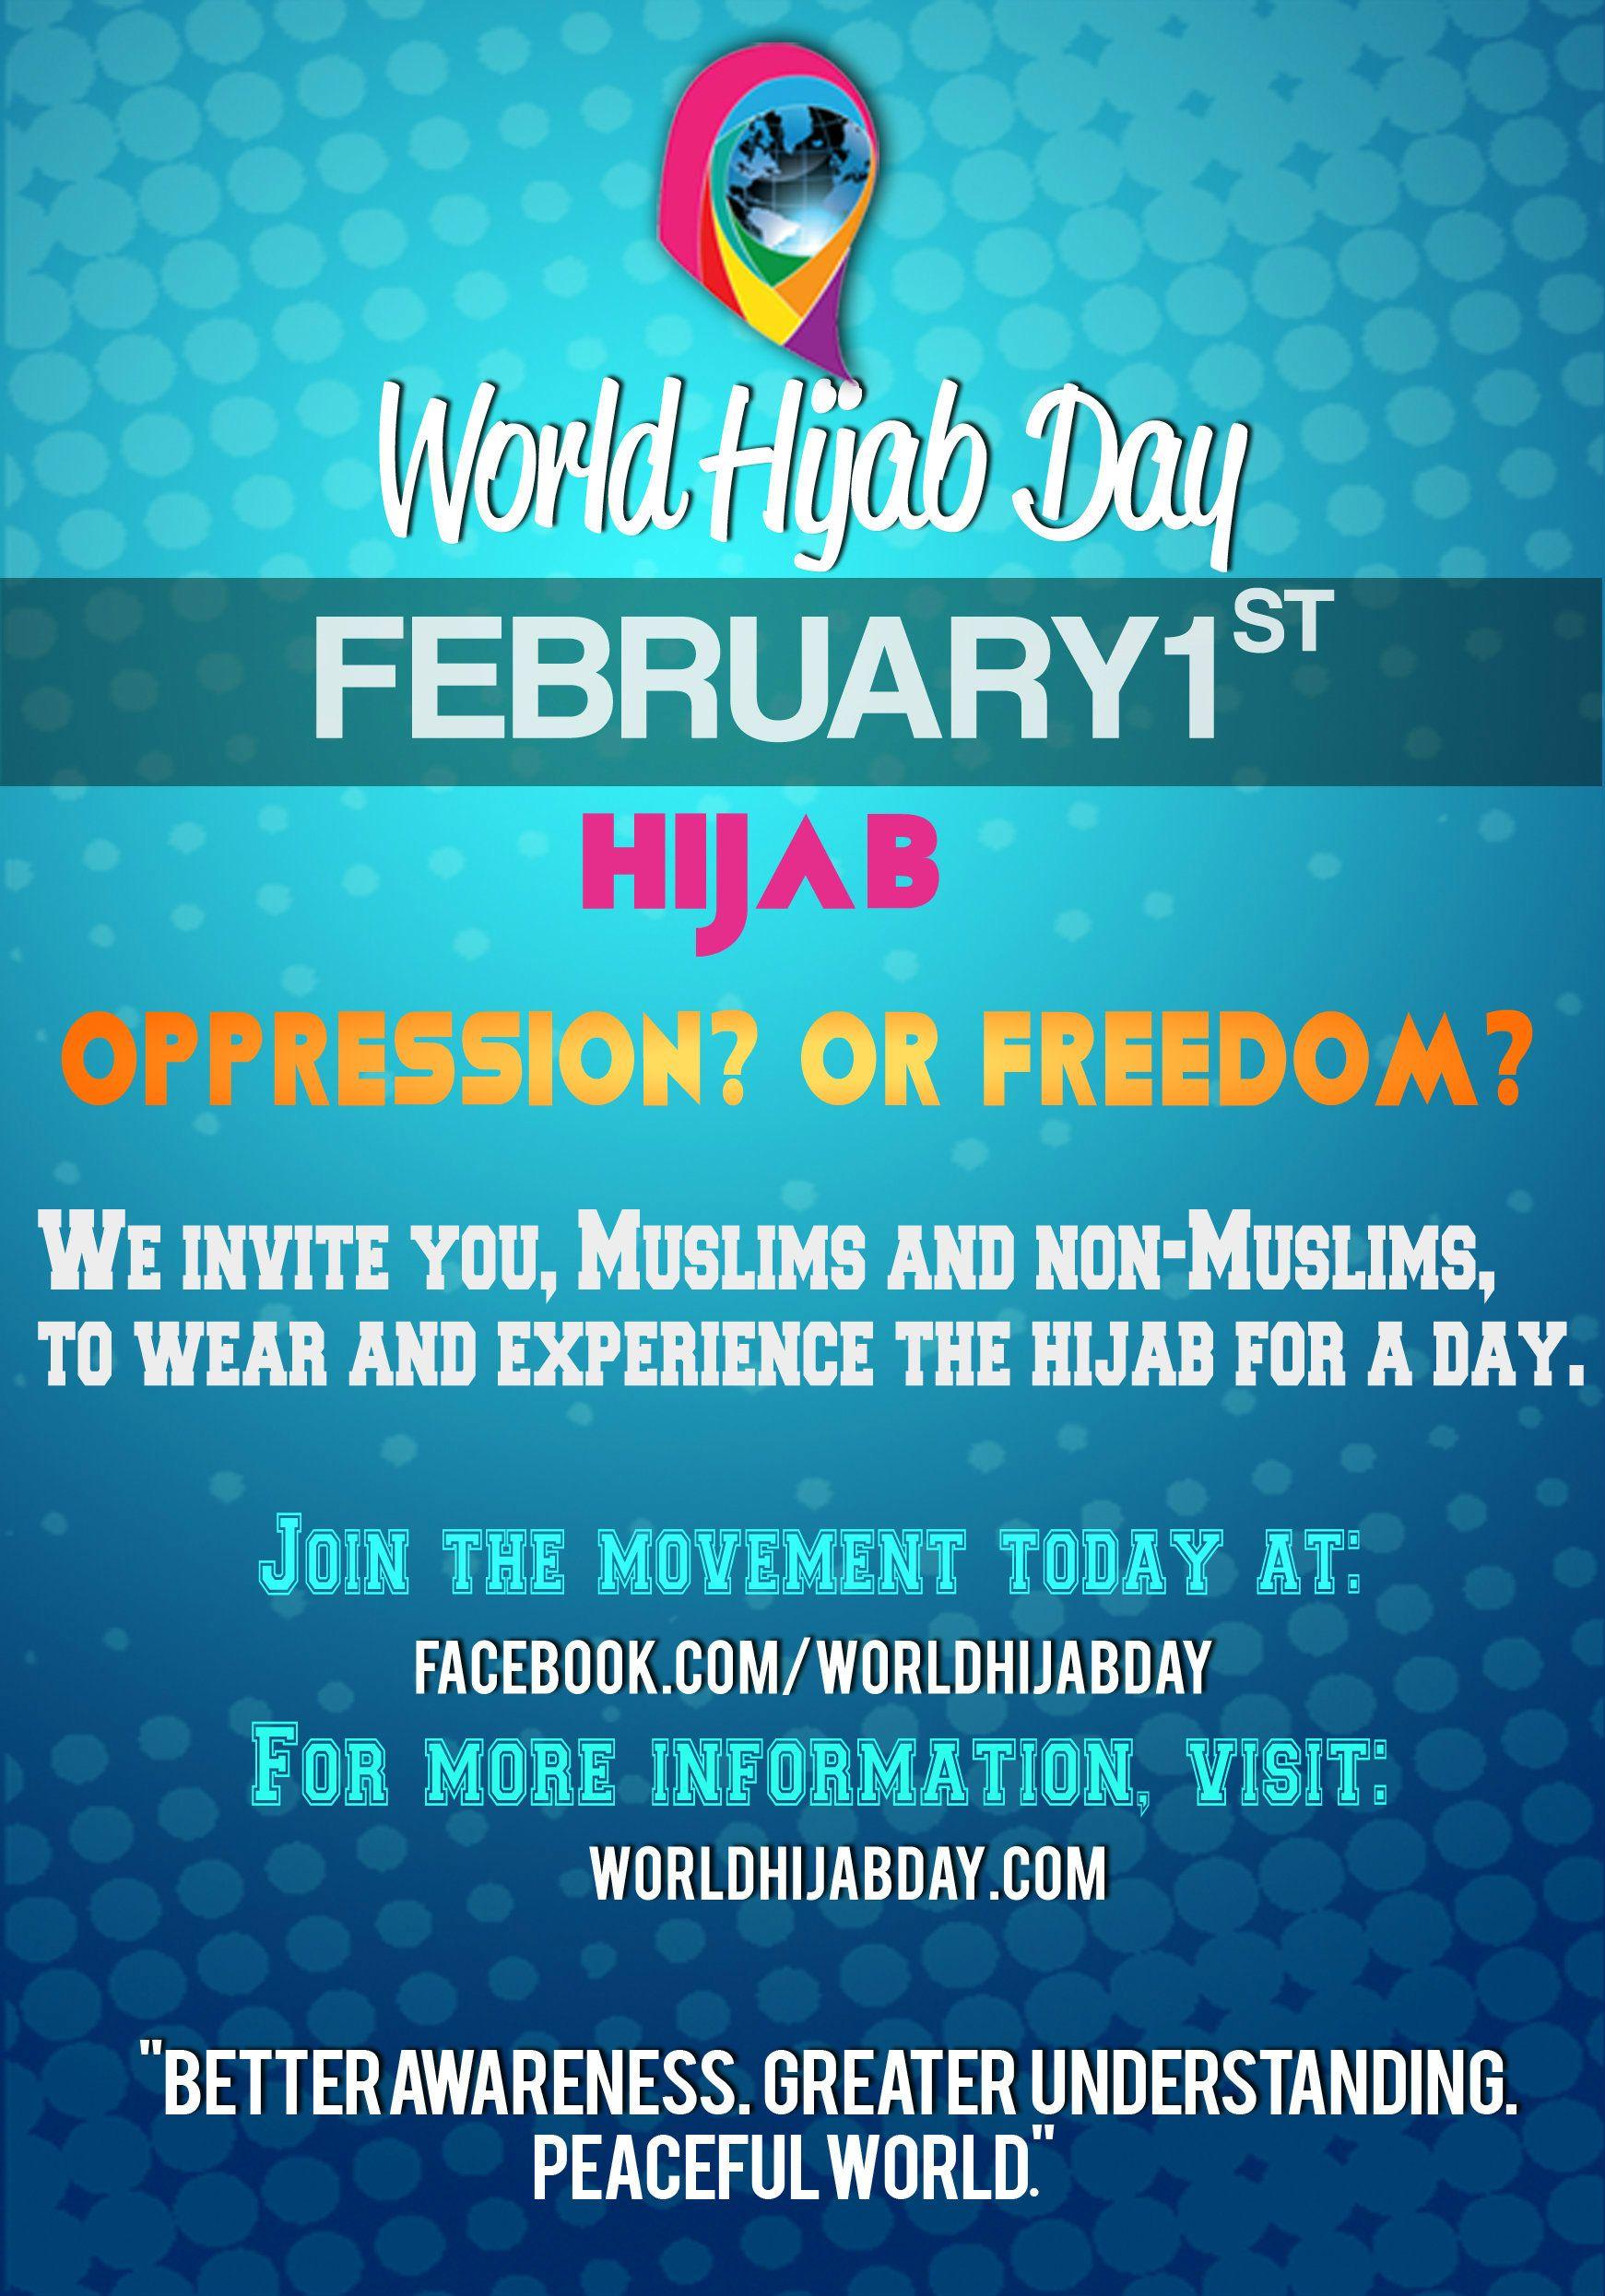 world hijab day #awareness #peace #islam #freedom #freedom of